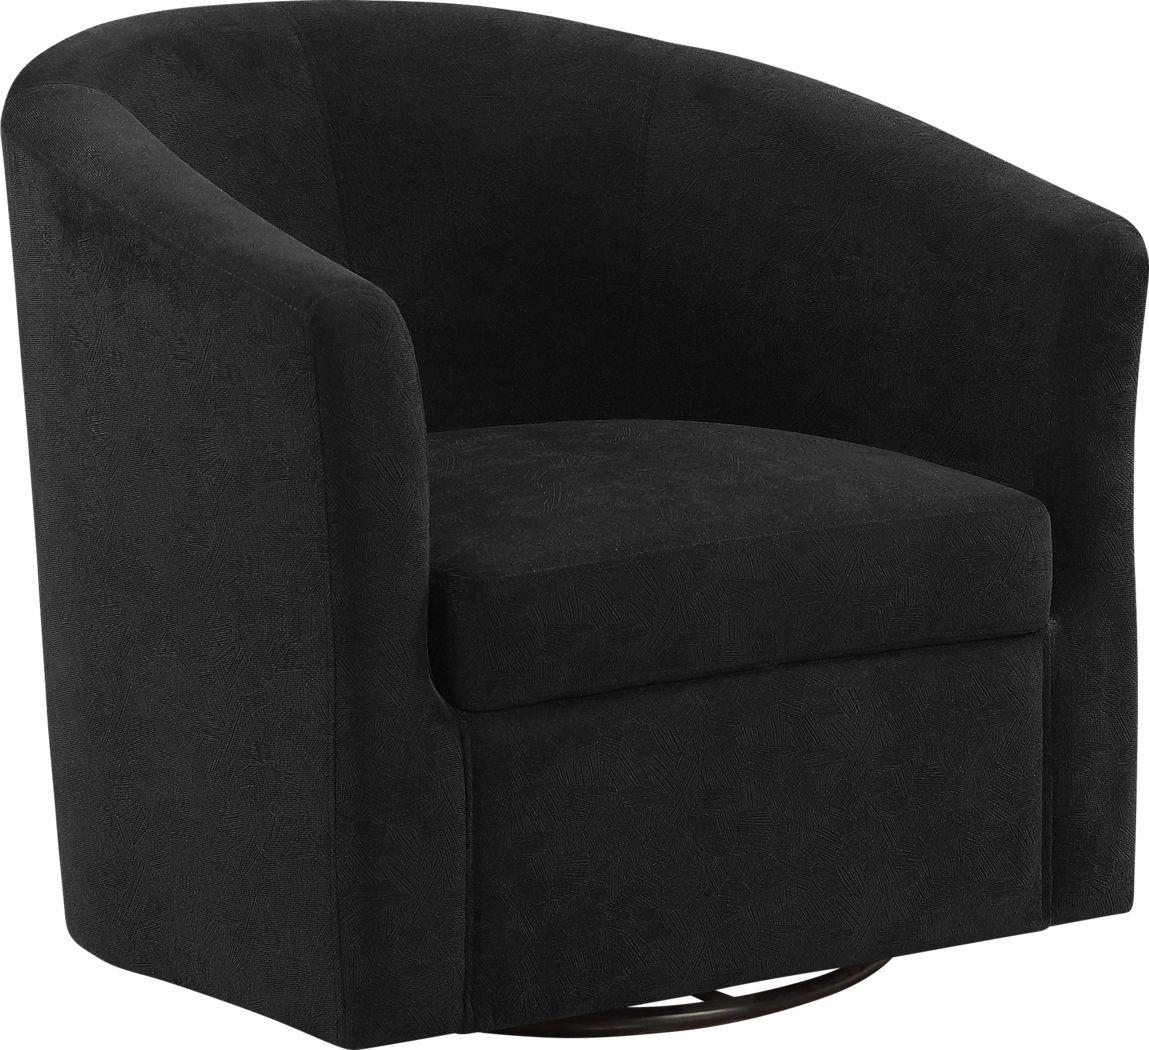 Cuttino Black Accent Swivel Chair